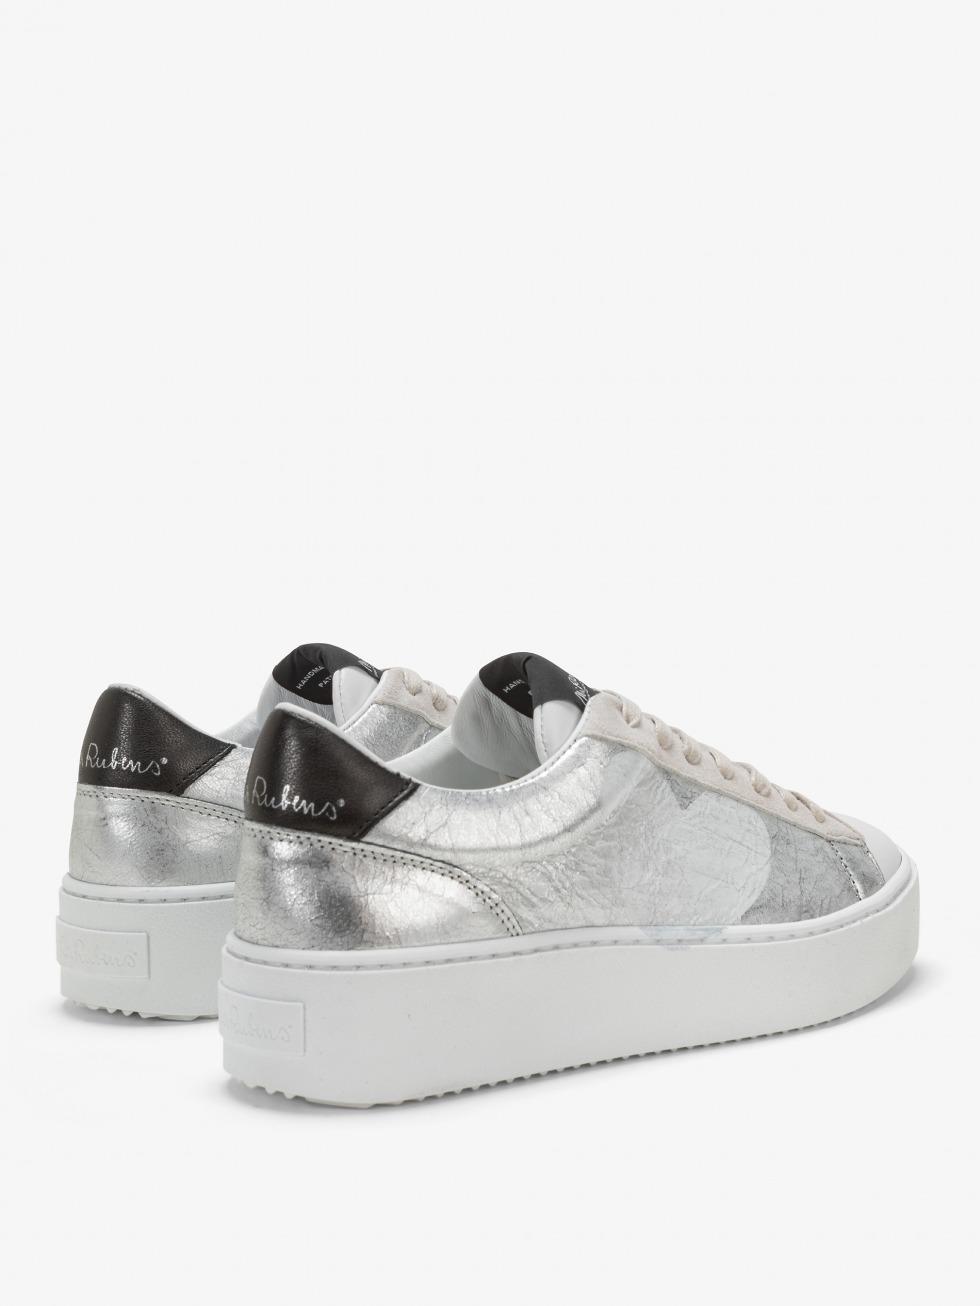 Cosmopolitan Sneakers Siderale White - Heart